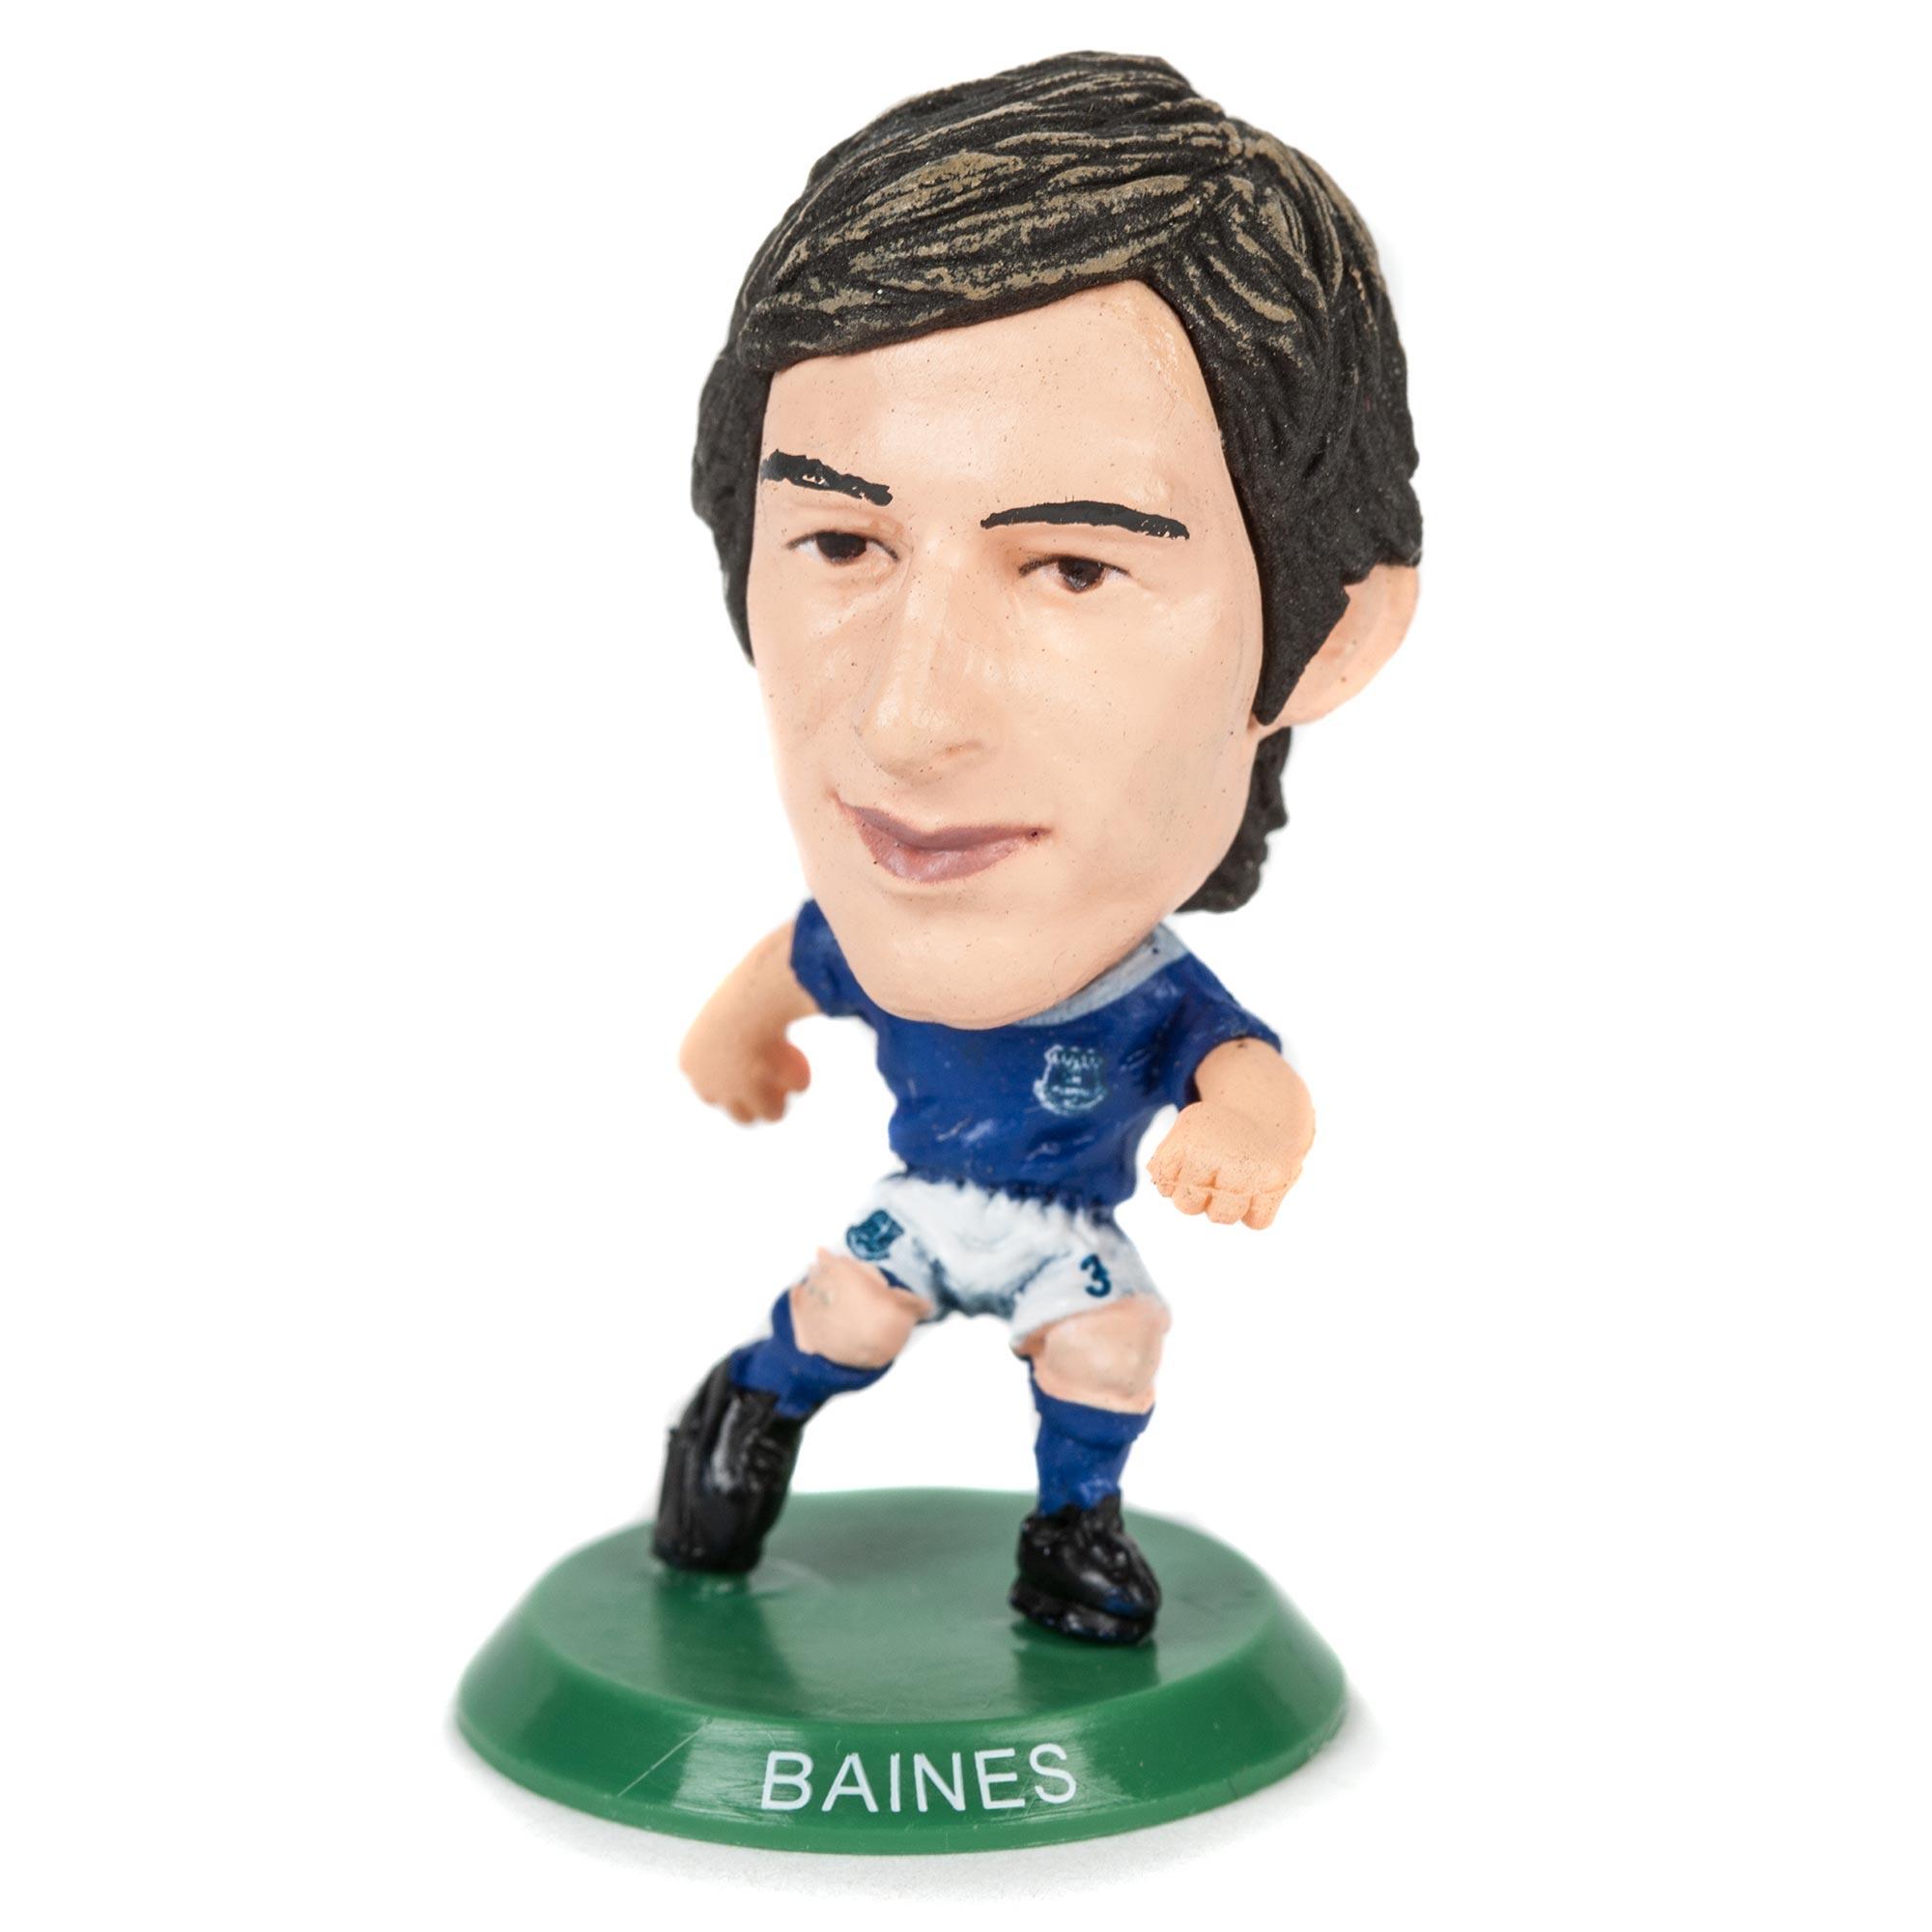 Image of Everton Baines SoccerStarz